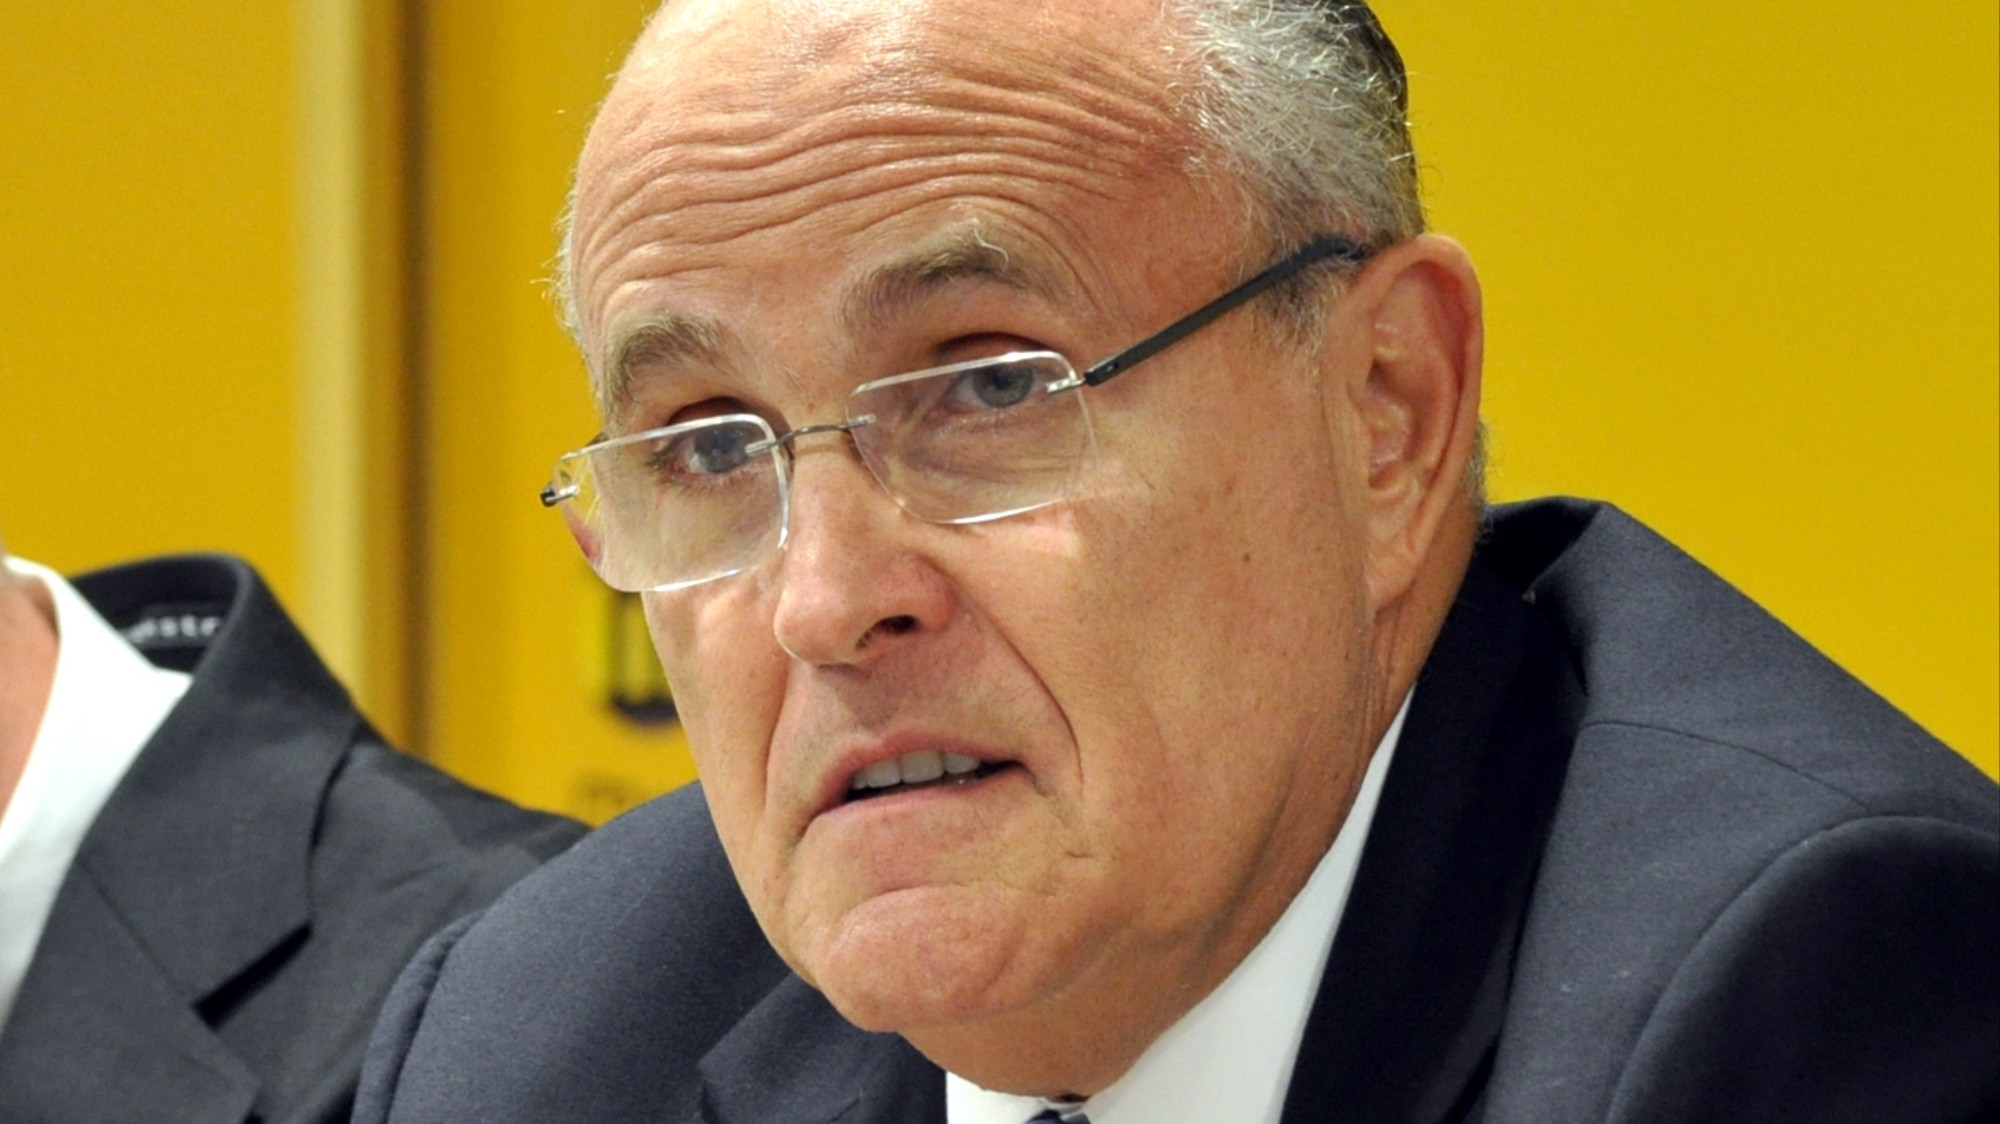 1544040175706-Rudy_Giuliani_2012-mcrs.jpeg